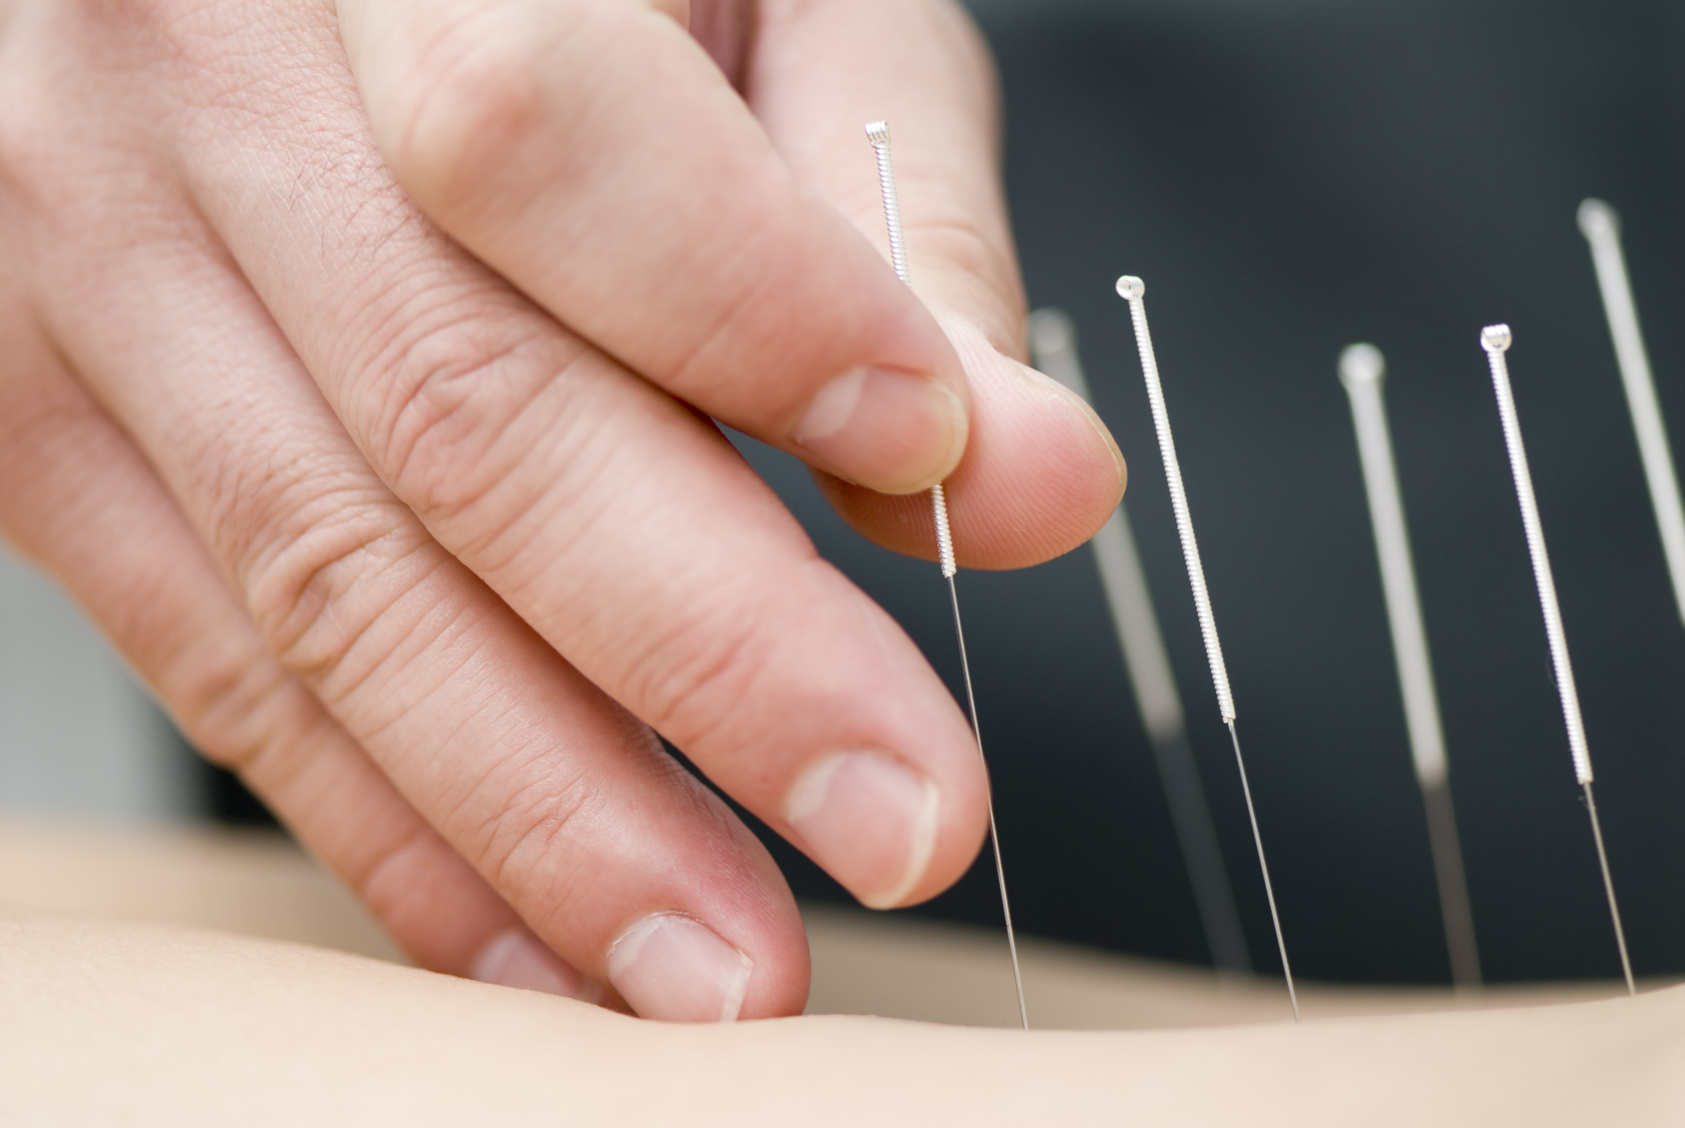 acupuncture-fertility-male.jpg